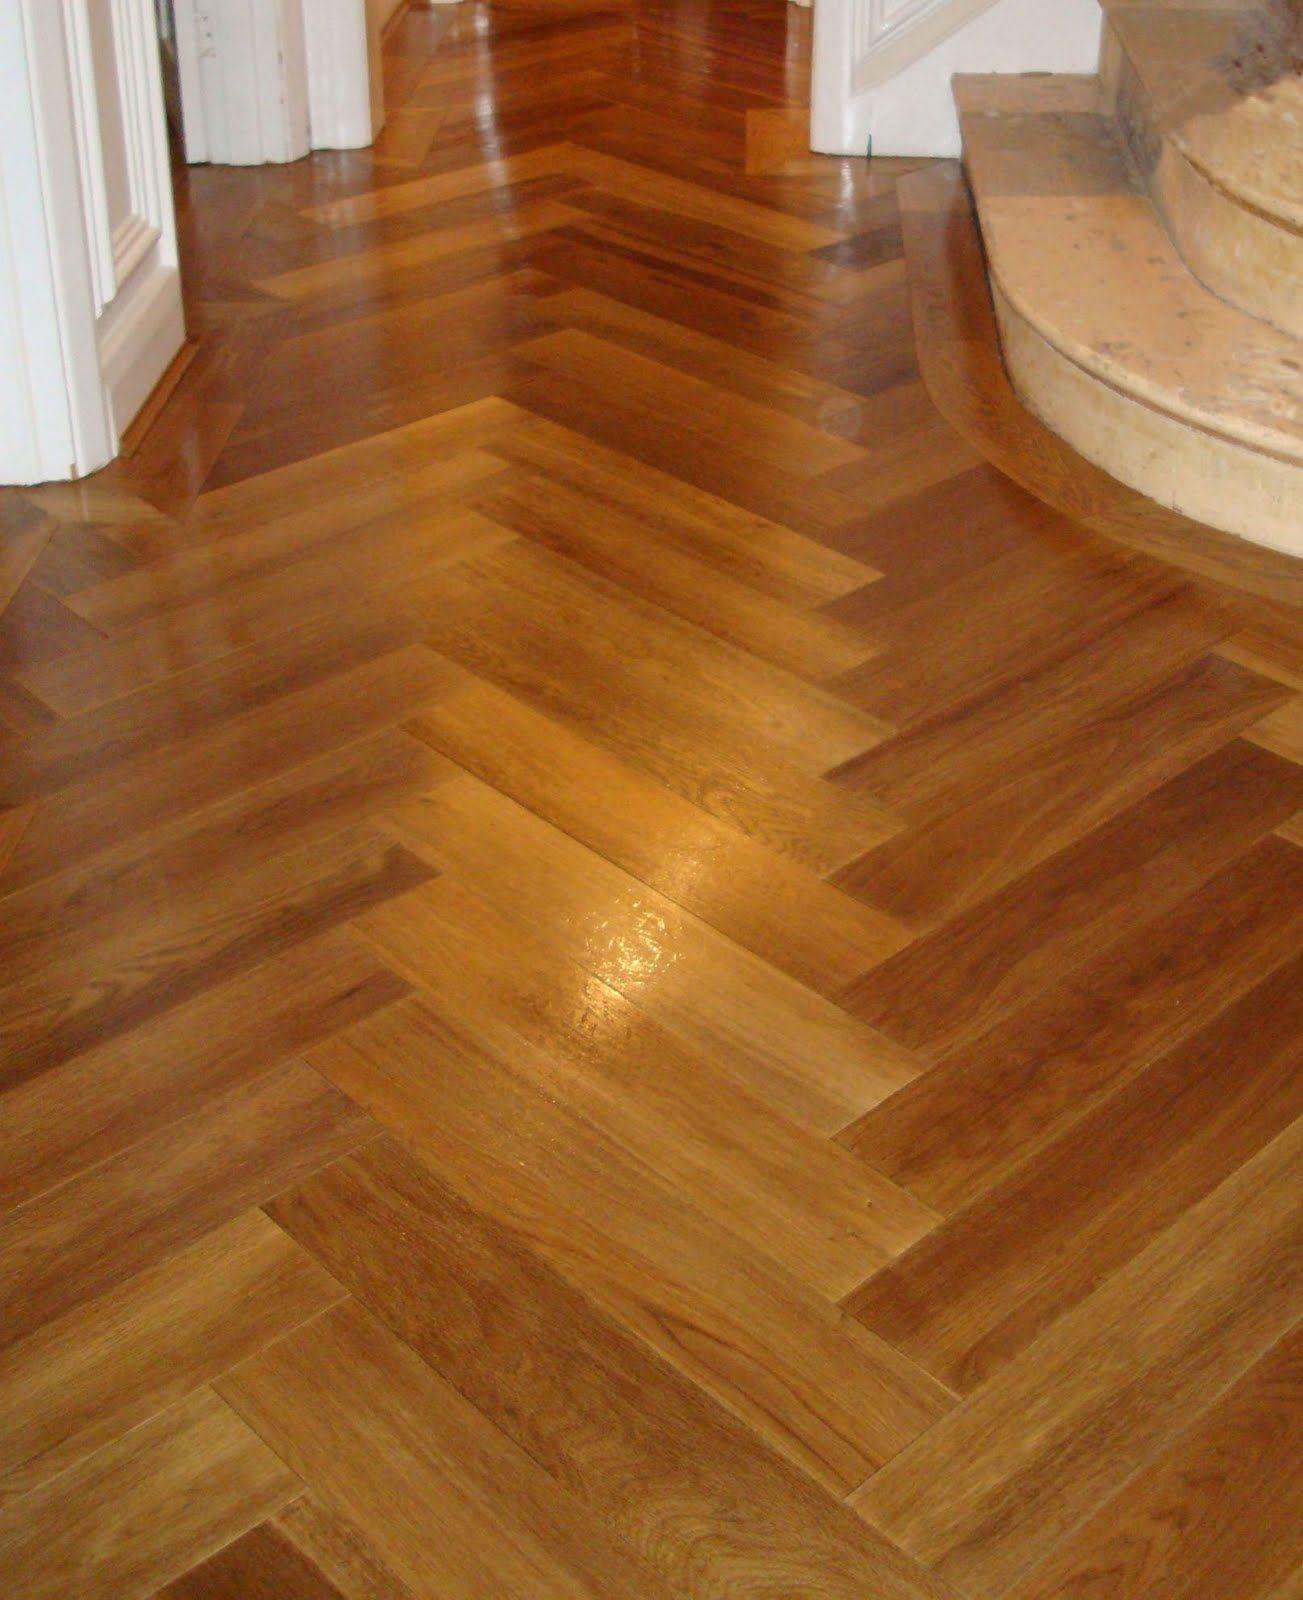 laying hardwood floor pattern of wood flooring ideas wood floorwood floor designwood floor design regarding wood flooring ideas wood floorwood floor designwood floor design ideas